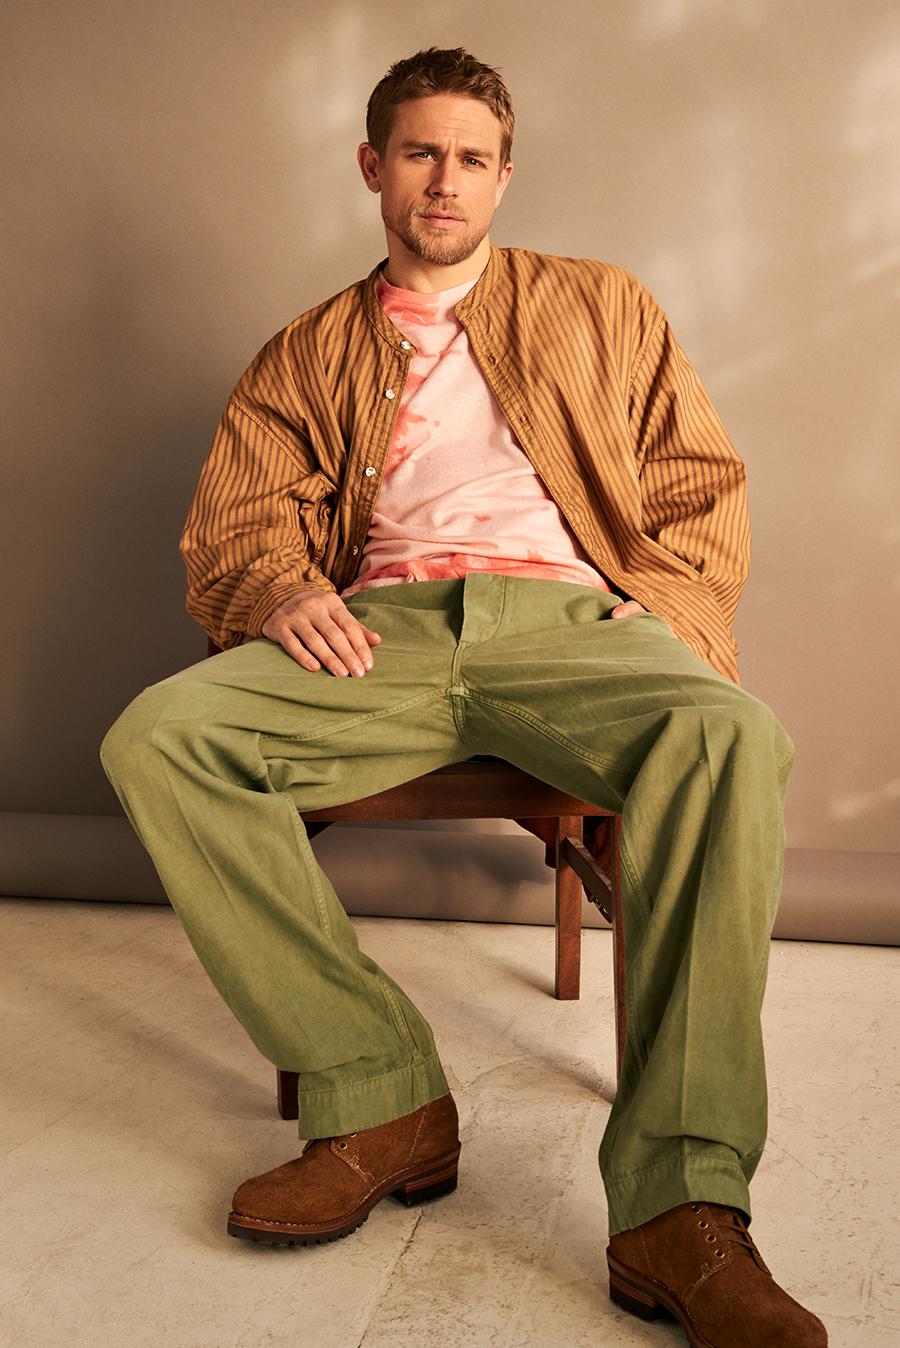 Charlie Hunnam MR PORTER